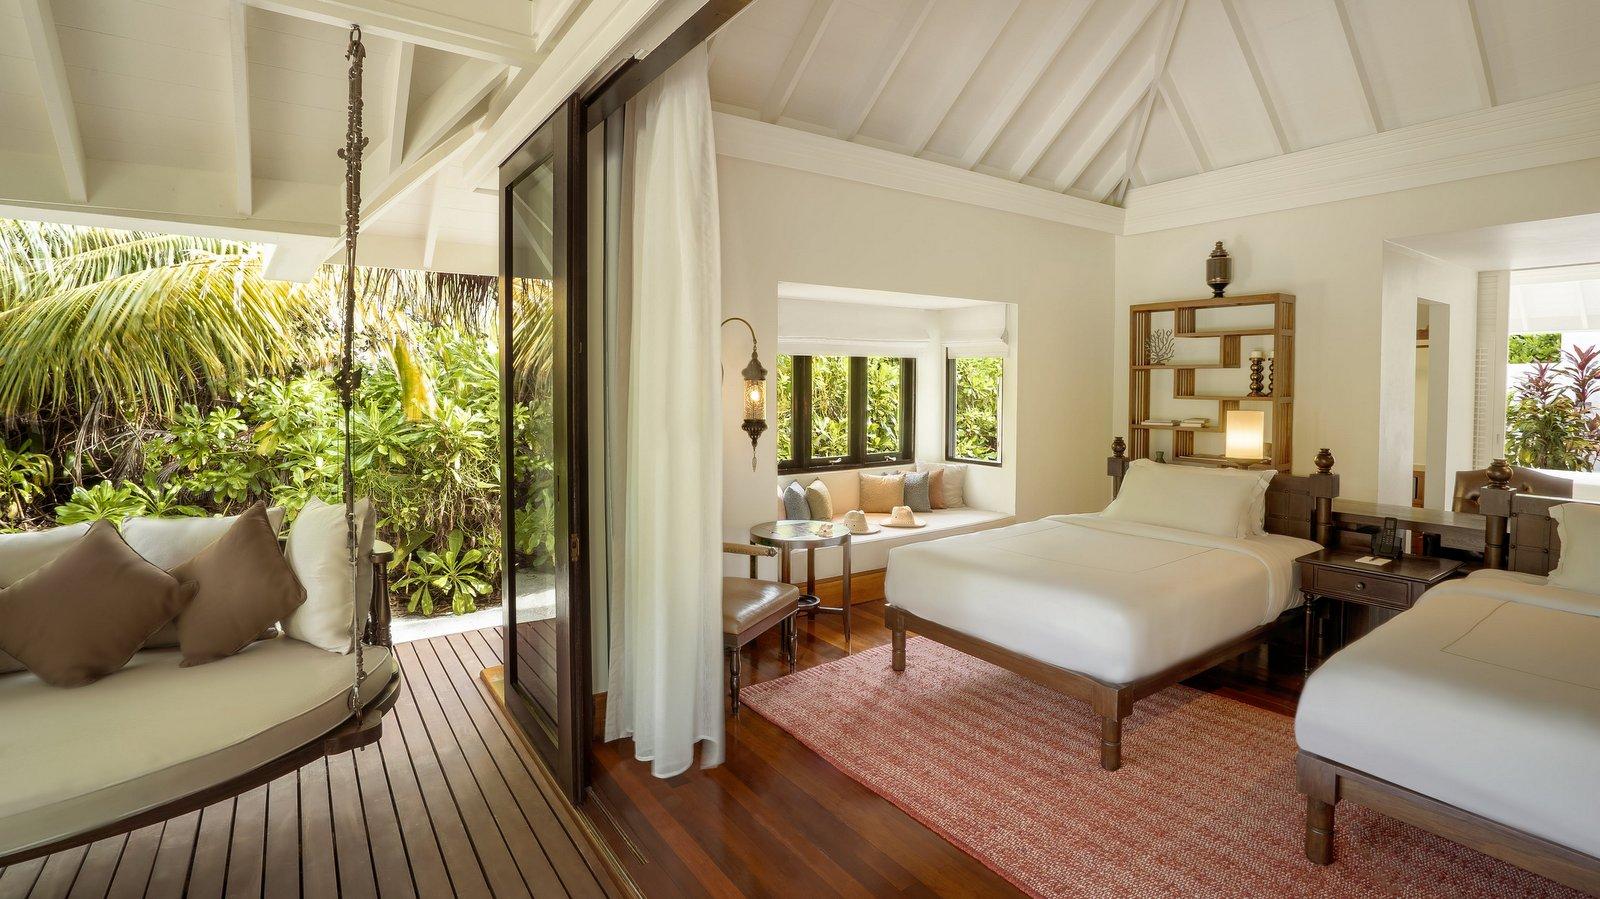 Мальдивы, отель Anantara Kihavah Maldives Villas, номер Family Beach Pool Villa